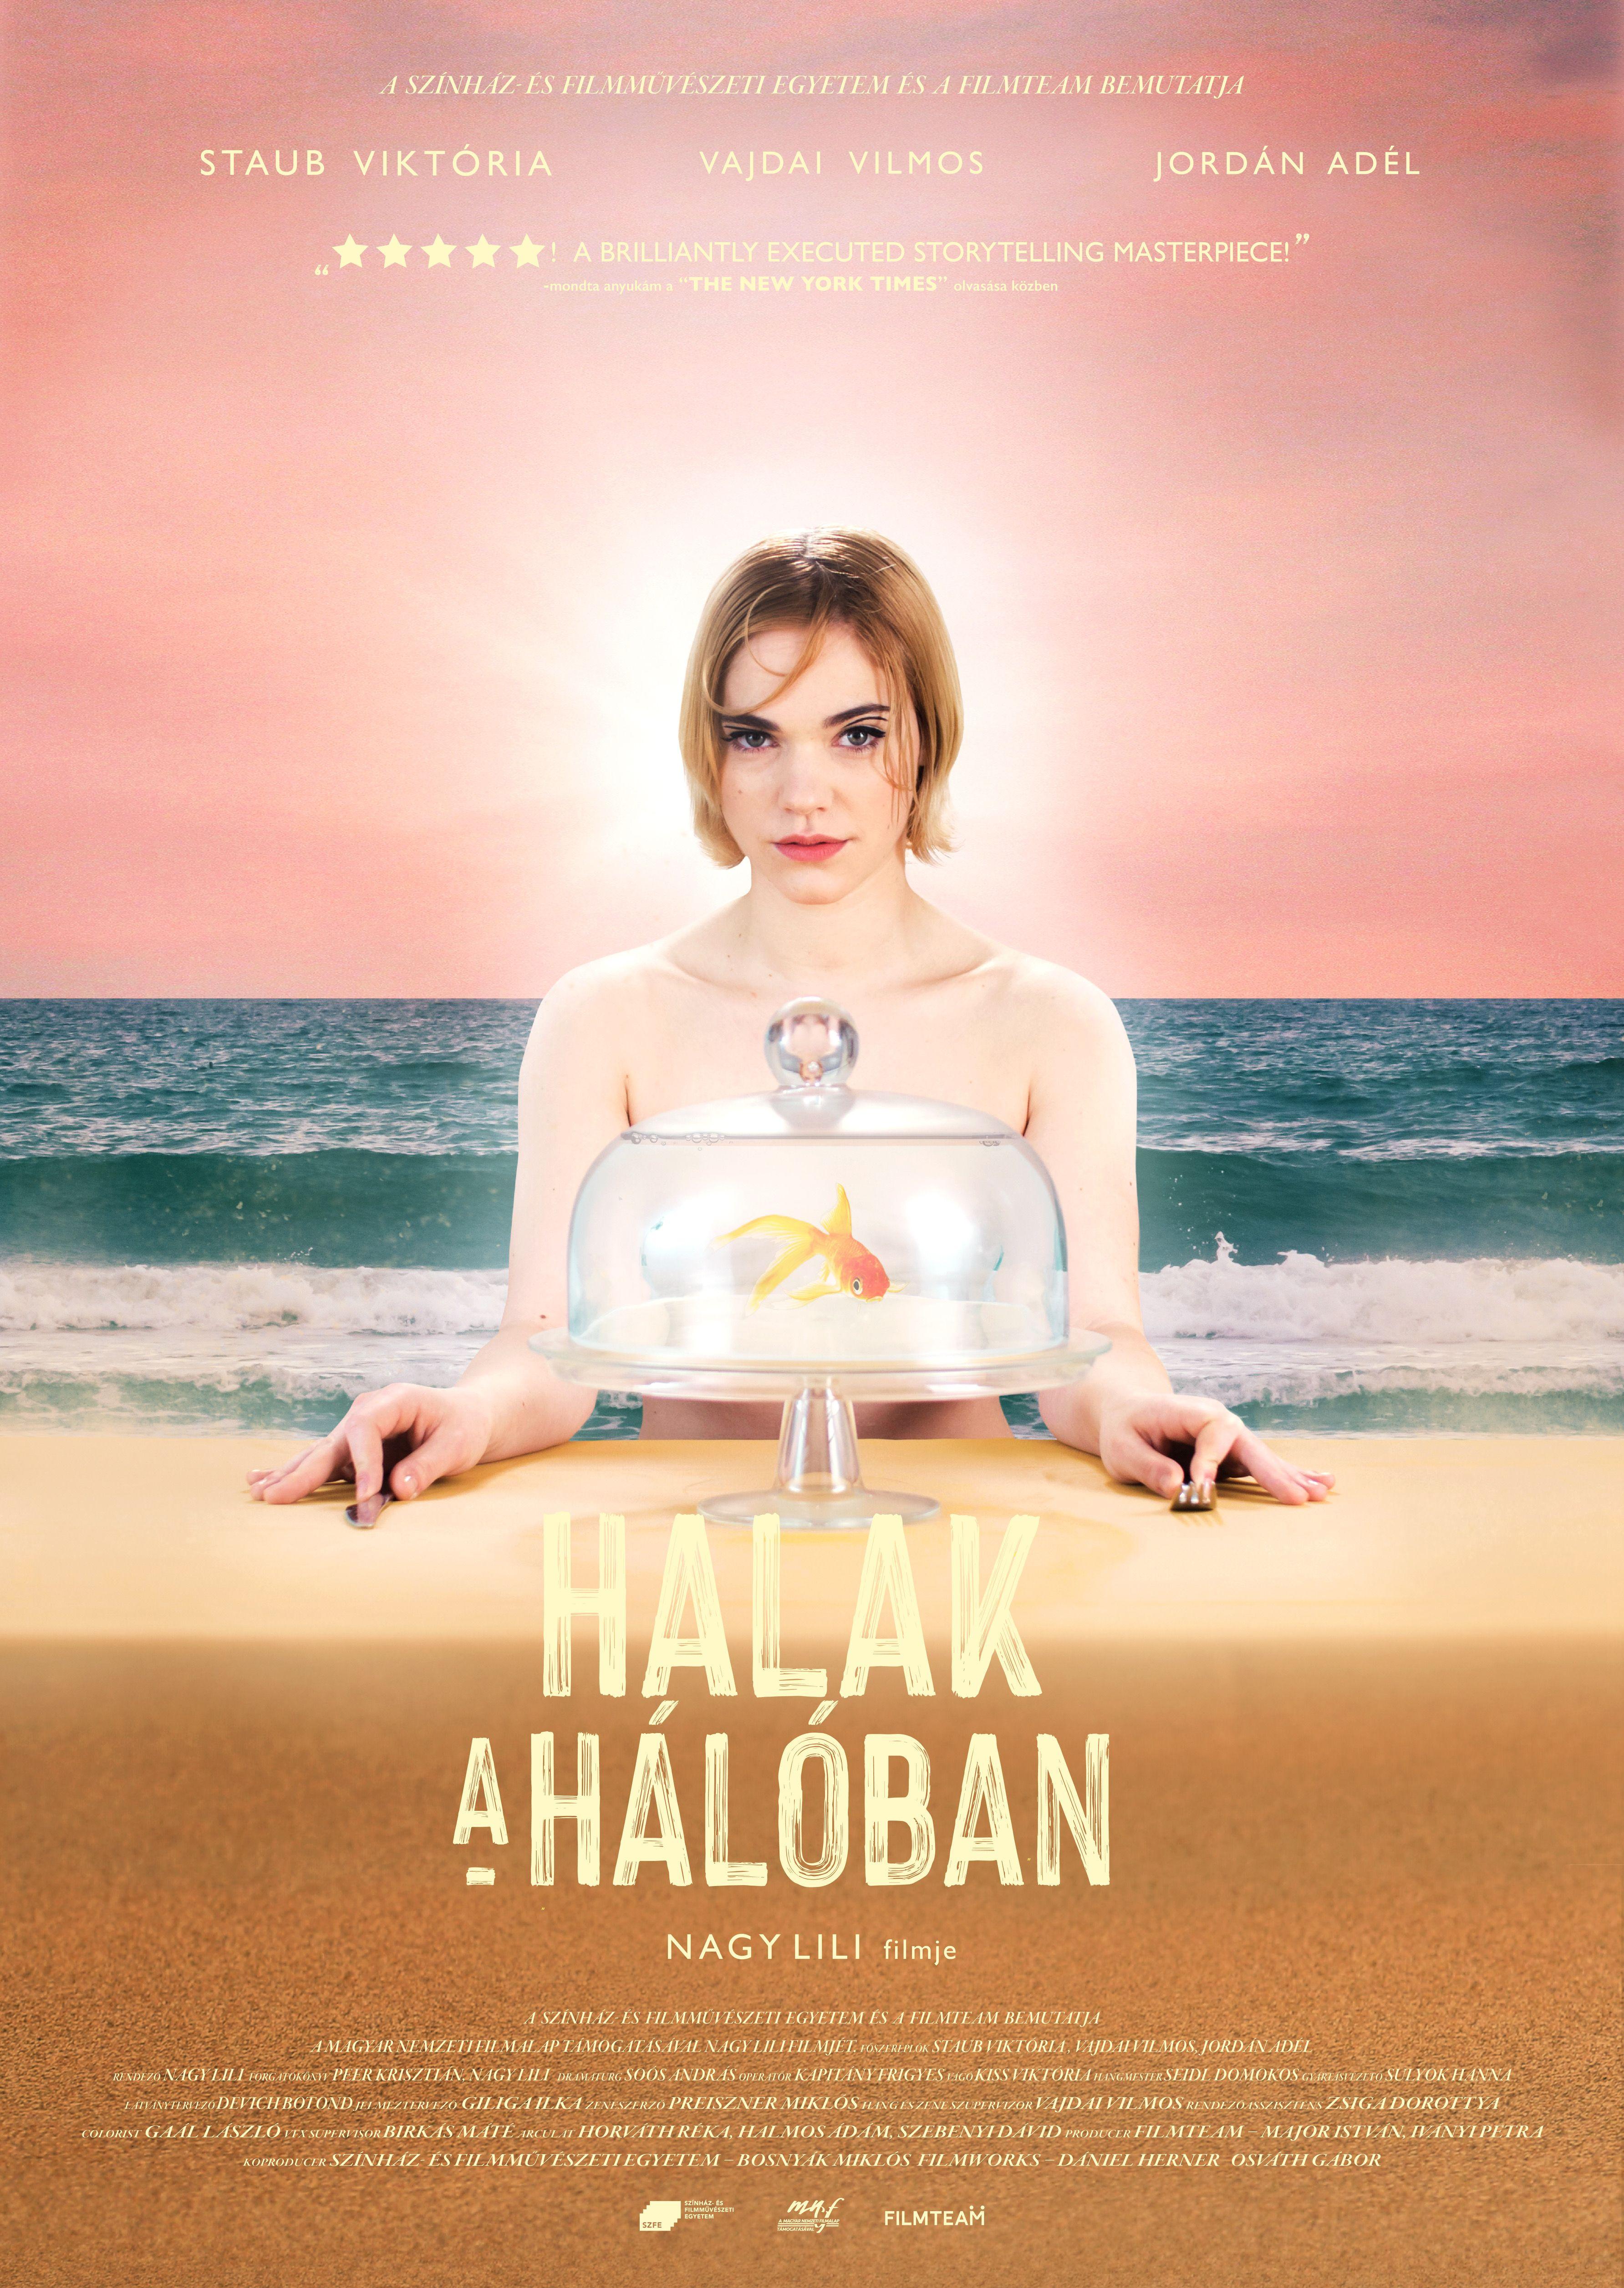 halak_a_haloban_poster.jpg